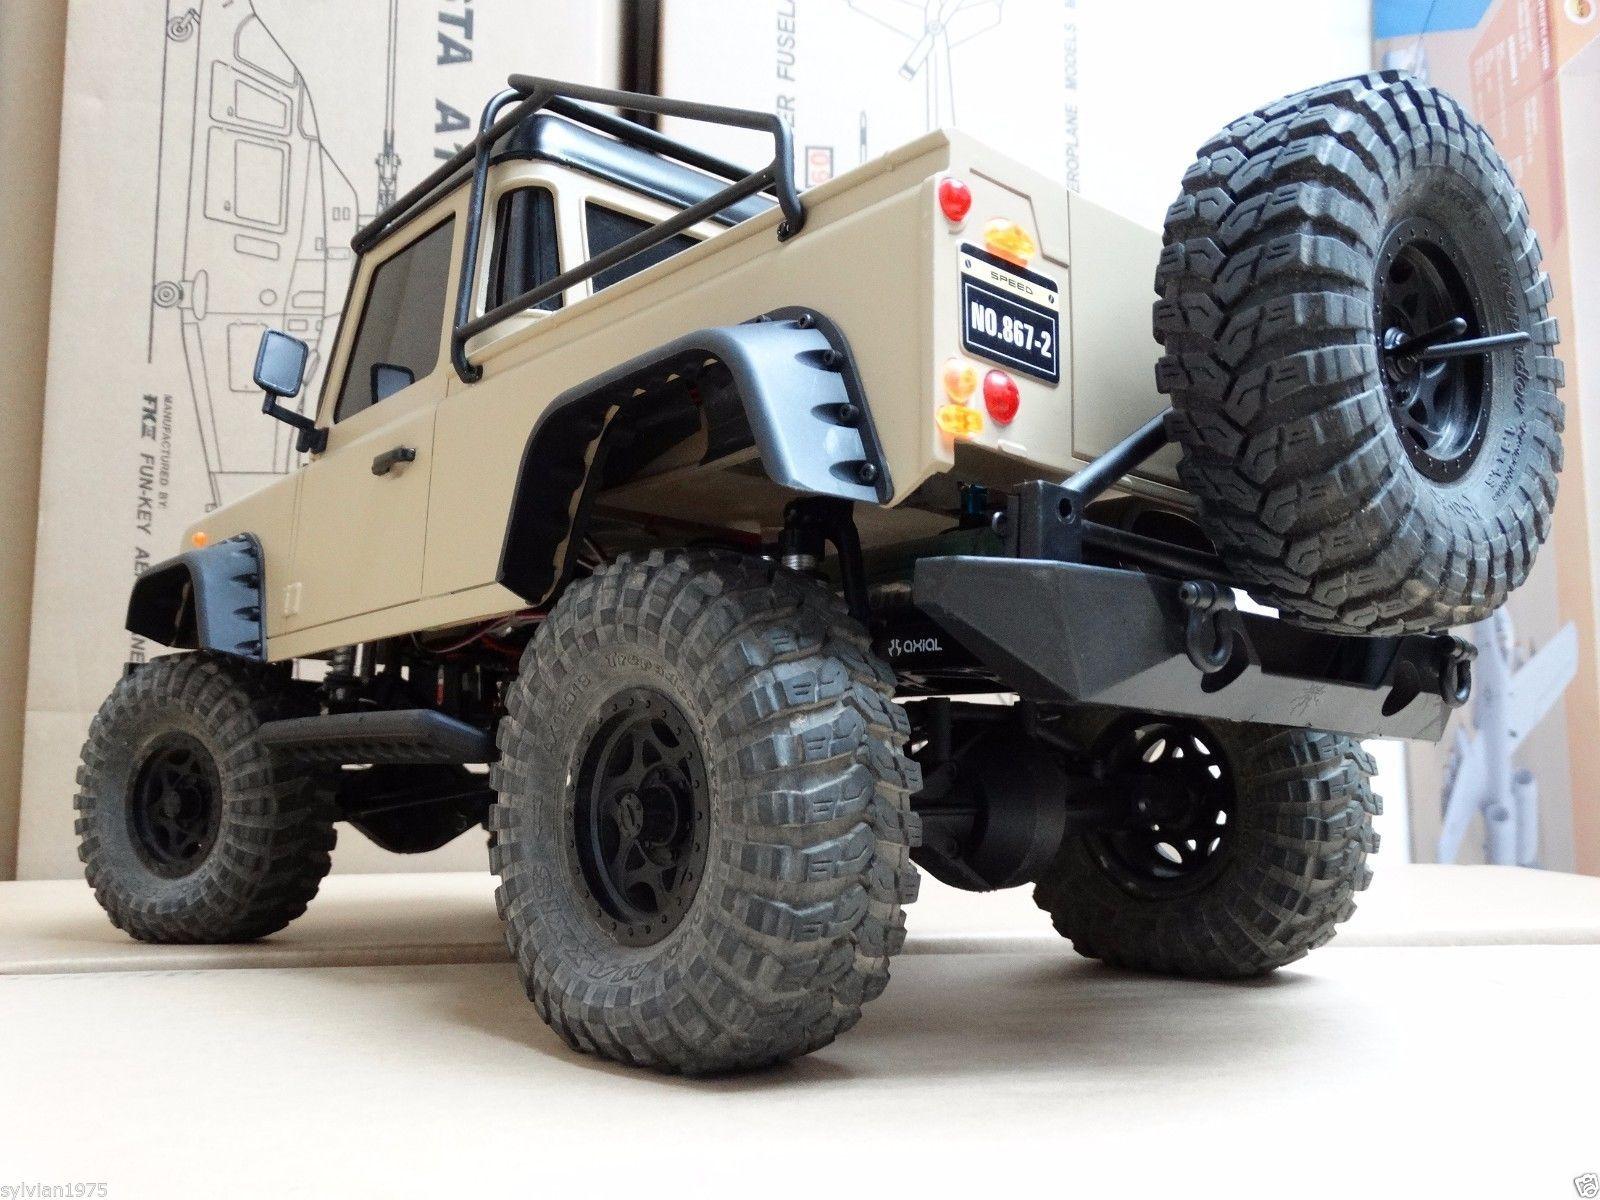 Safari Snorkel METAL ROLL CAGE 313 mm 1//10 Defender D90 Pick Up Truck Body